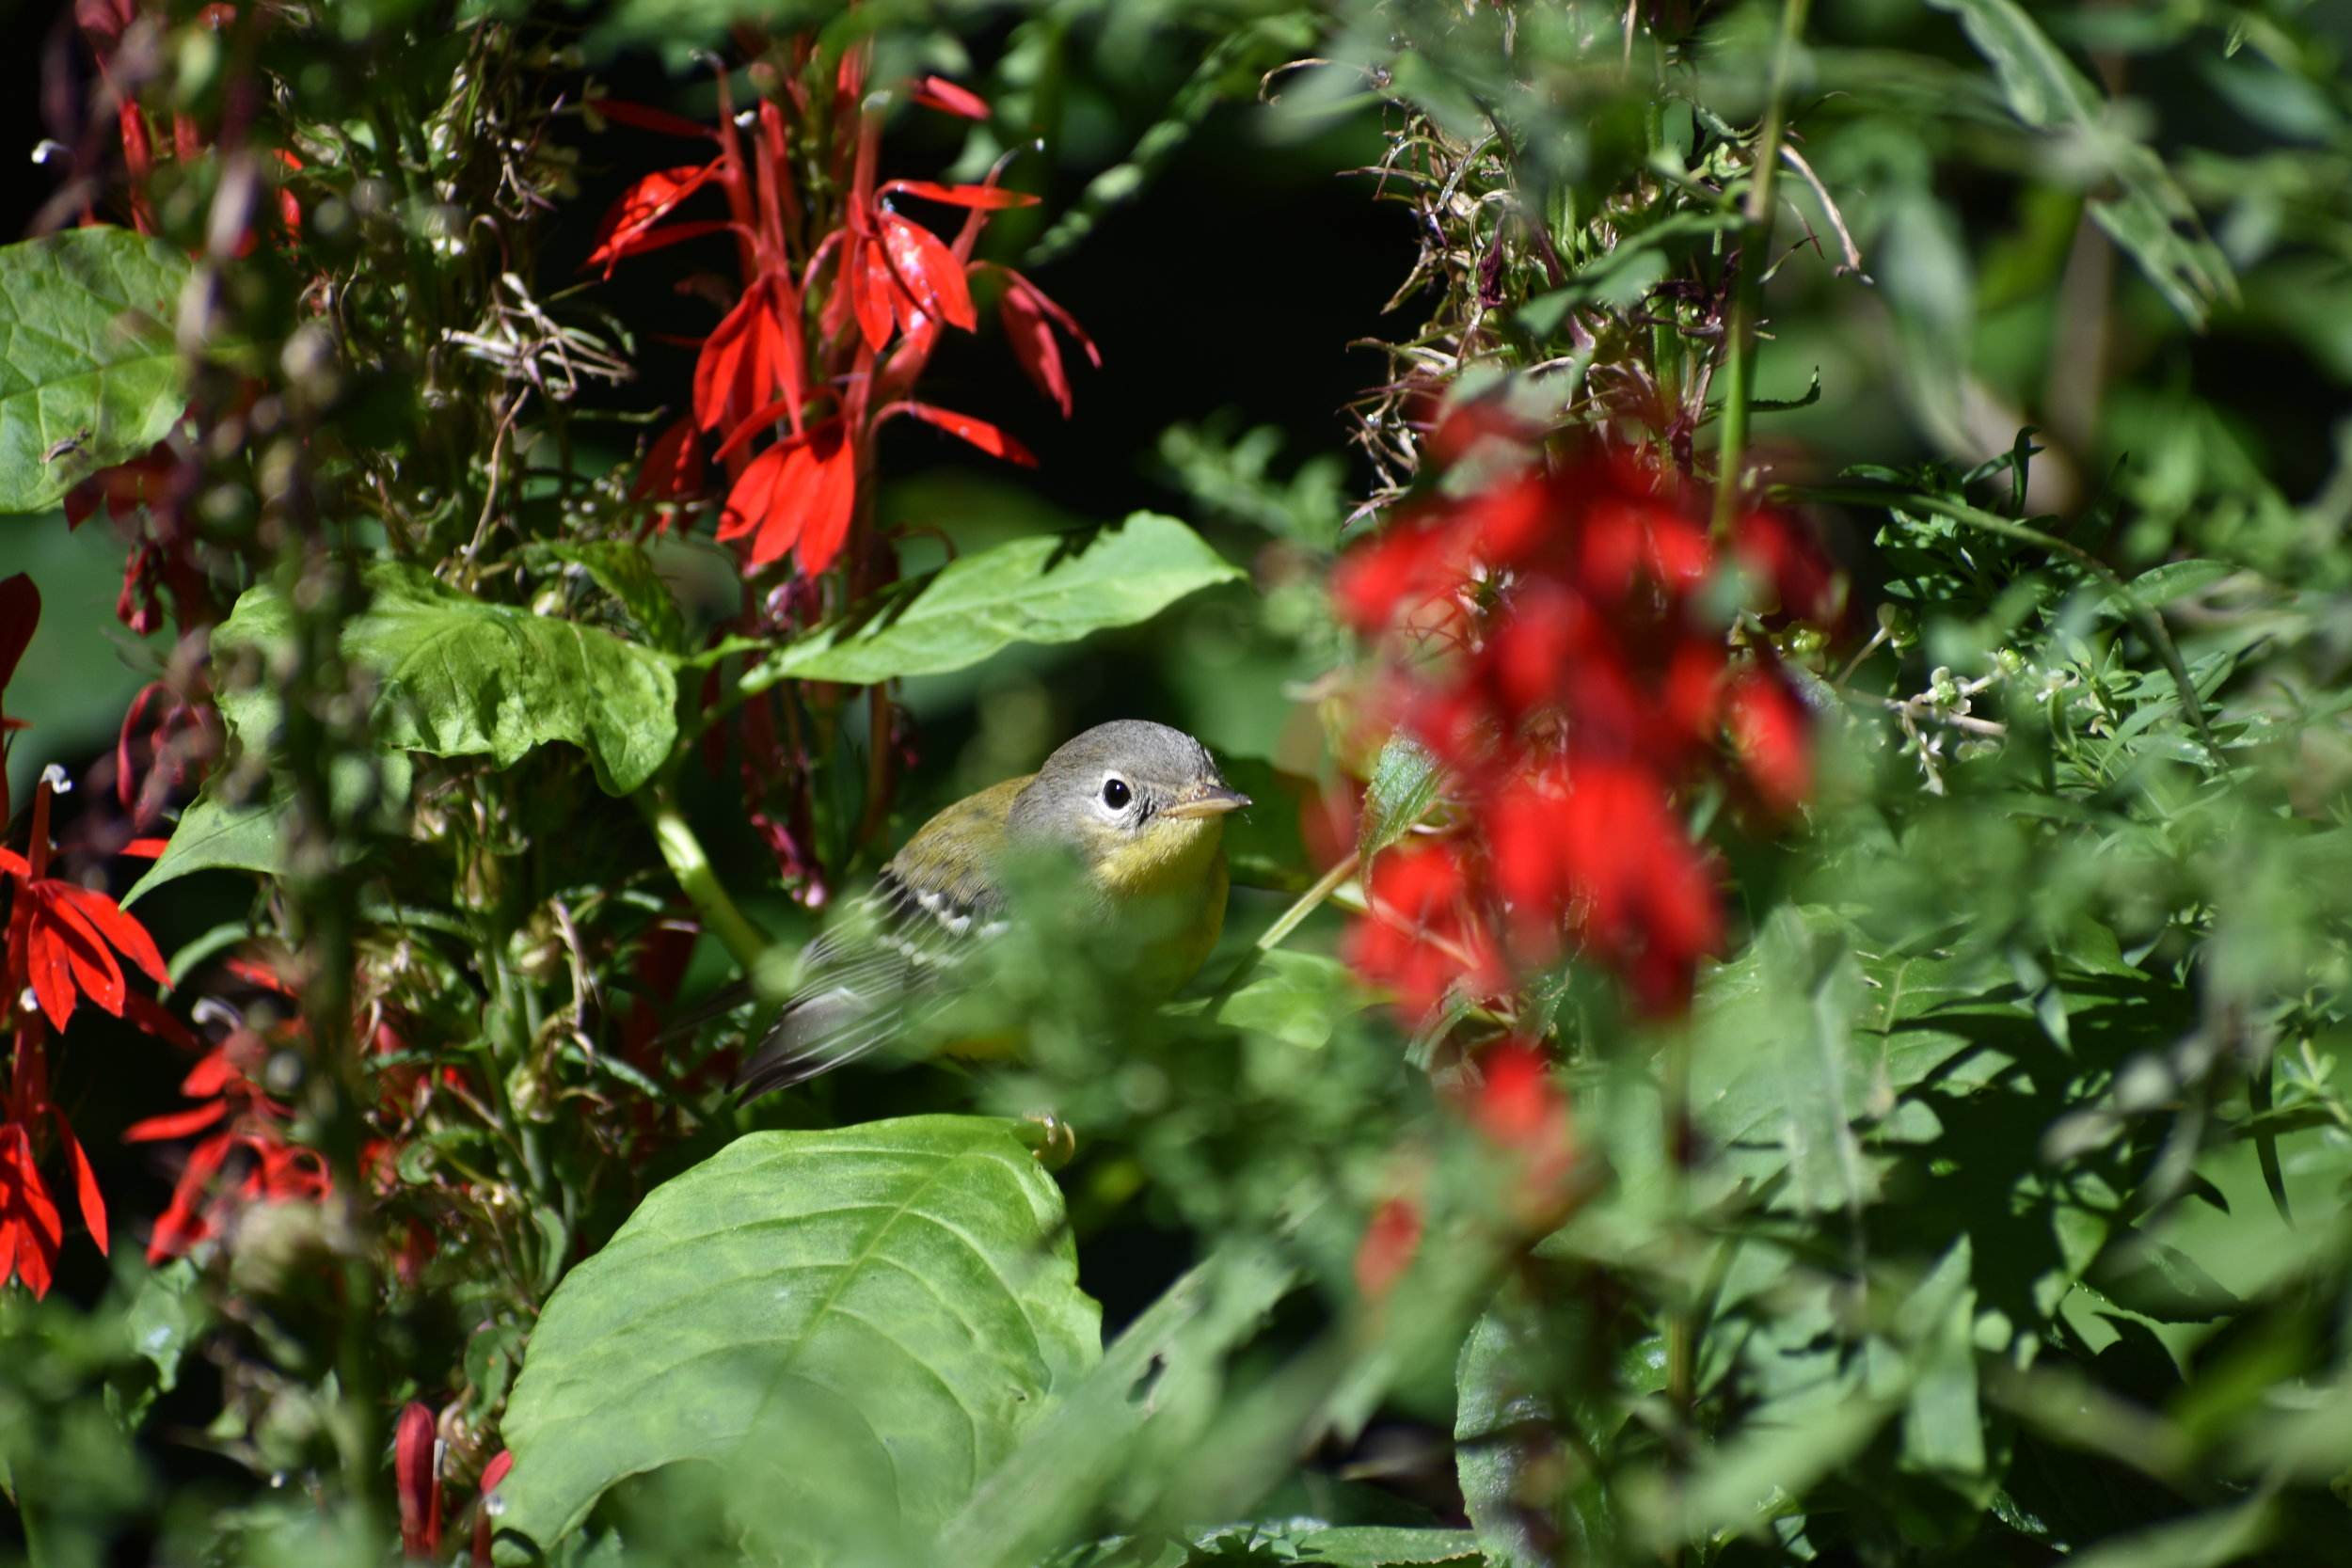 Magnolia Warbler & Cardinal Flower